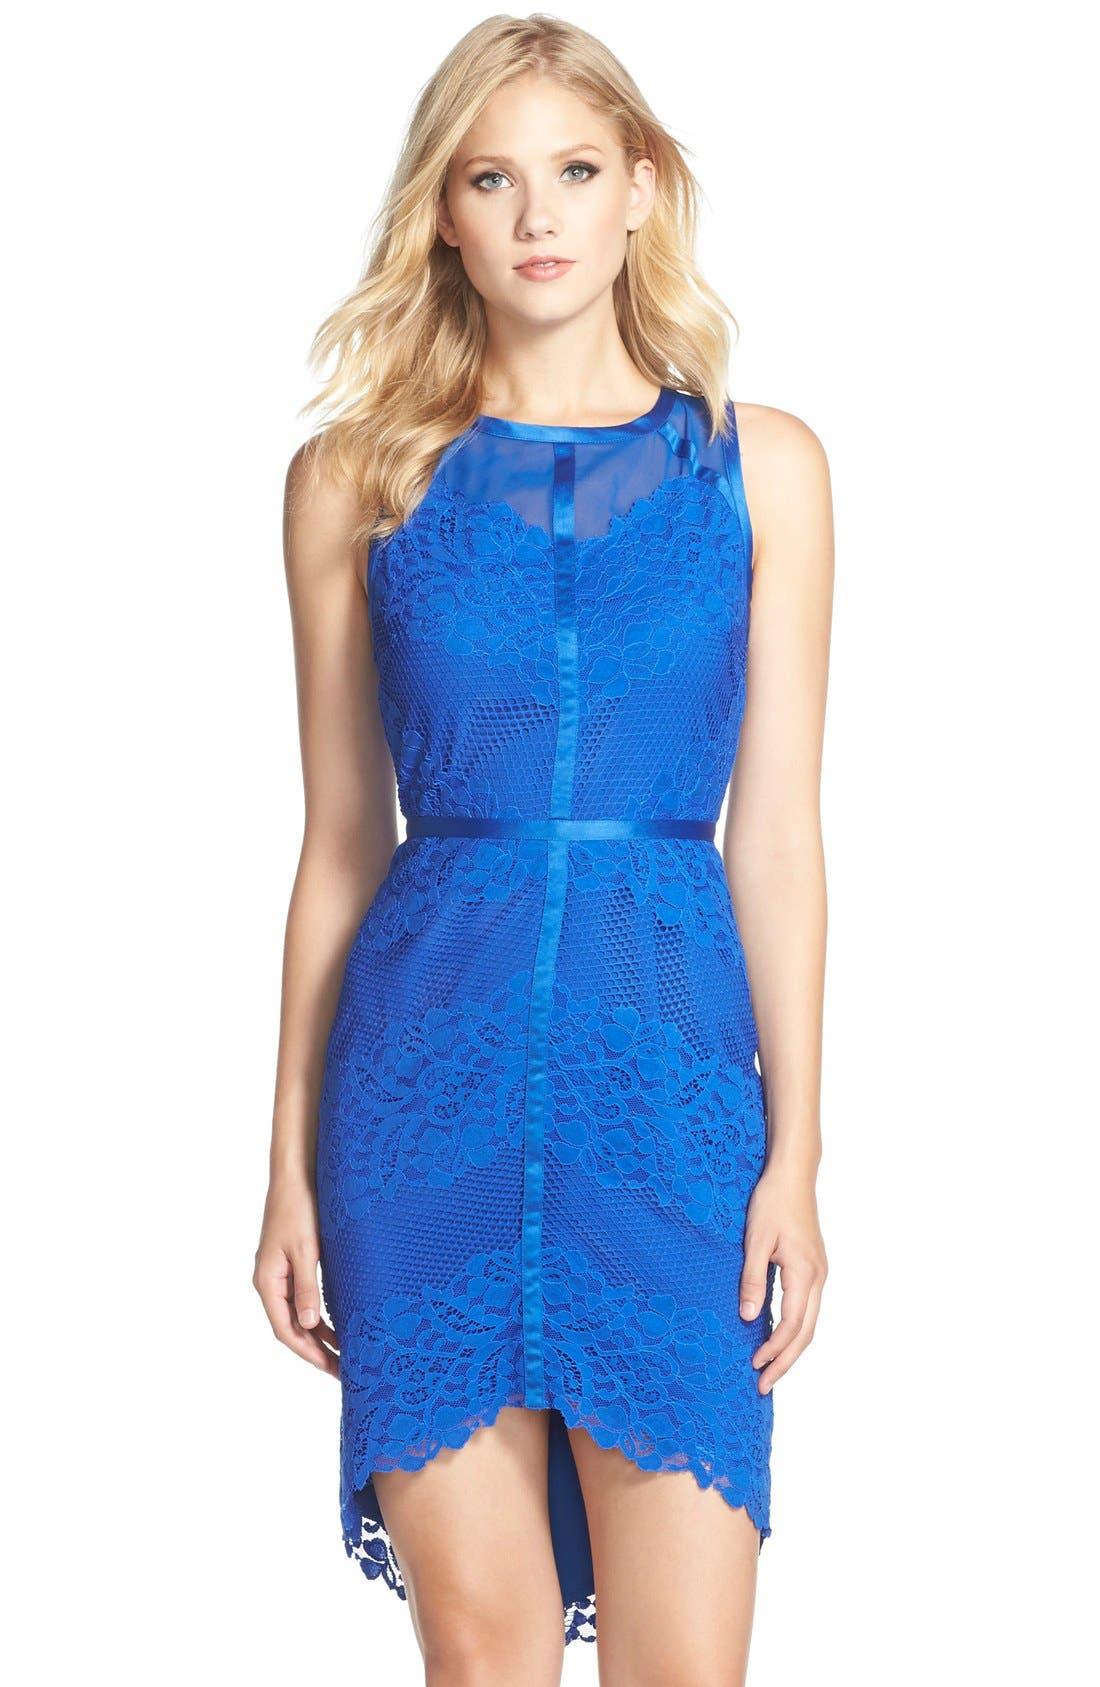 Alternate Image 1 Selected - Adelyn Rae Lace, Mesh & Chiffon Sheath Dress